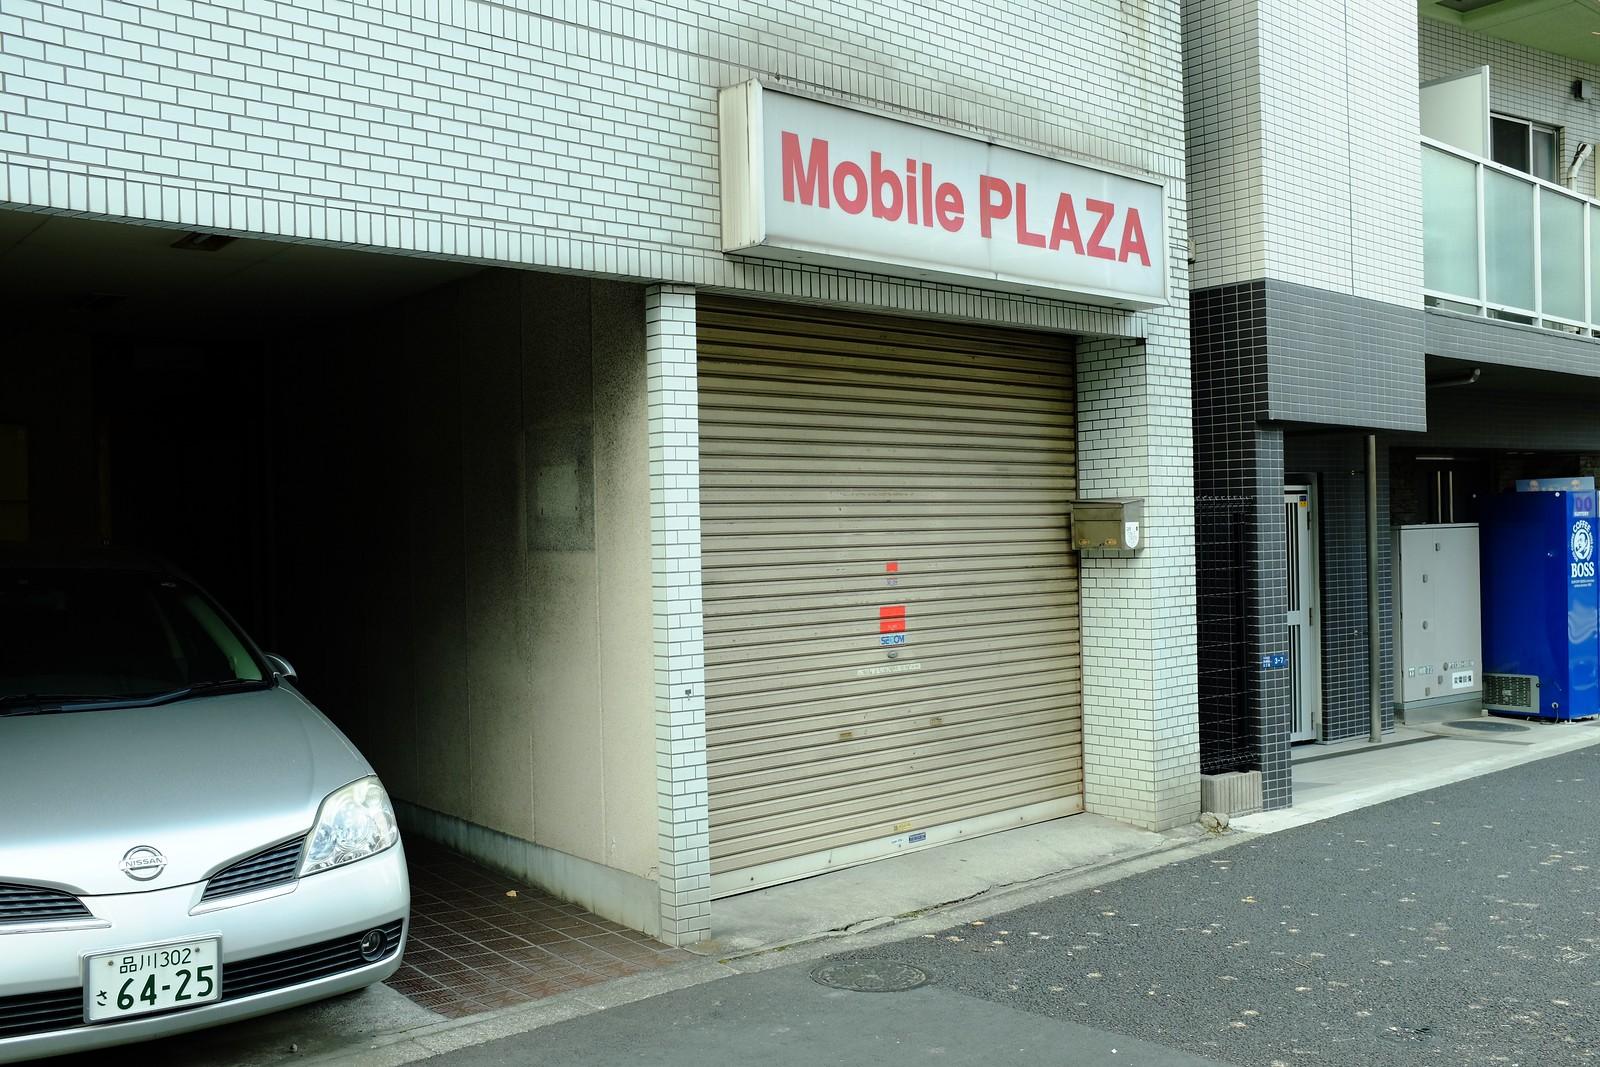 Akihabara Mobile PLAZA